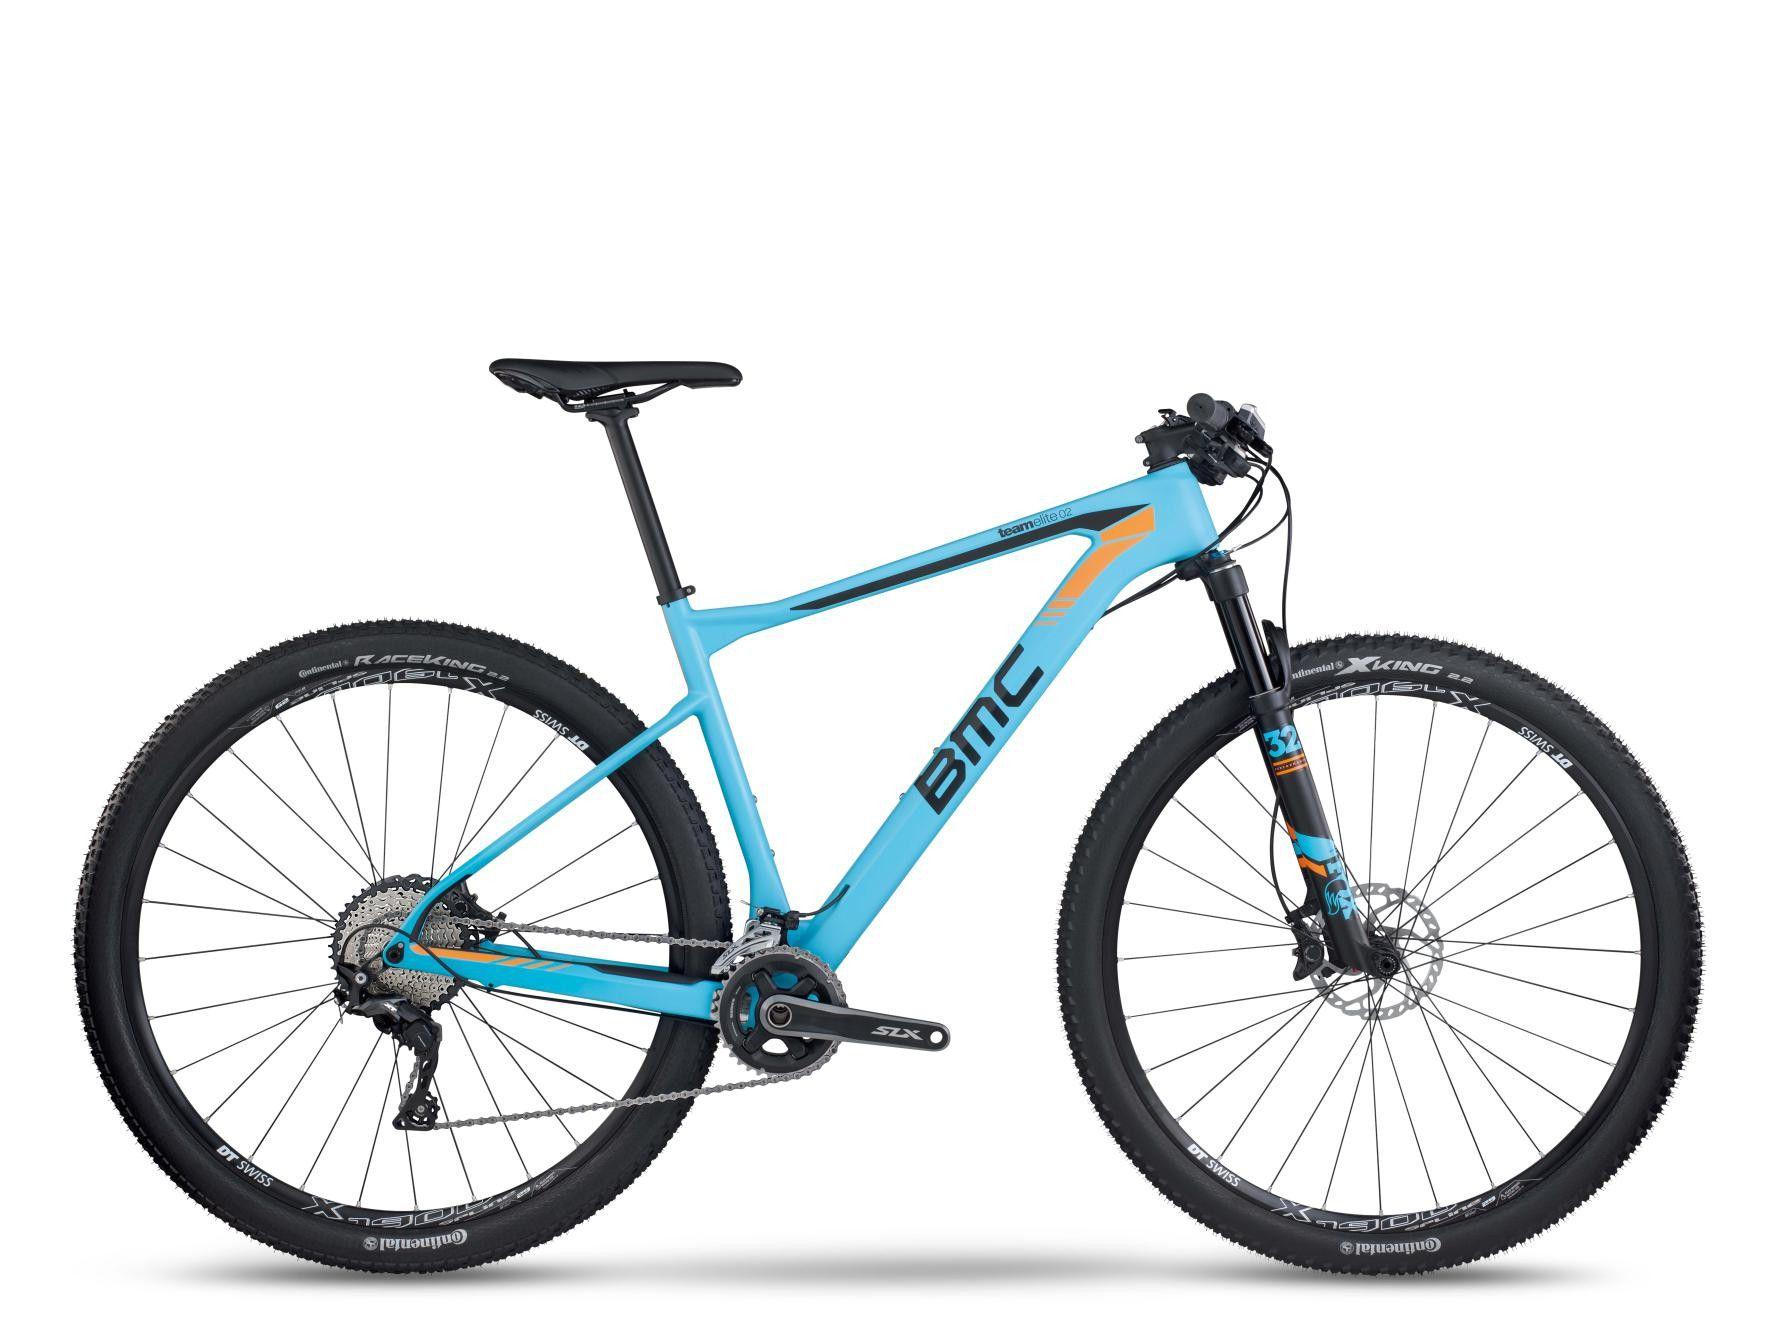 Bicicleta aro 29 BMC Team Elite 02 Carbon 2017